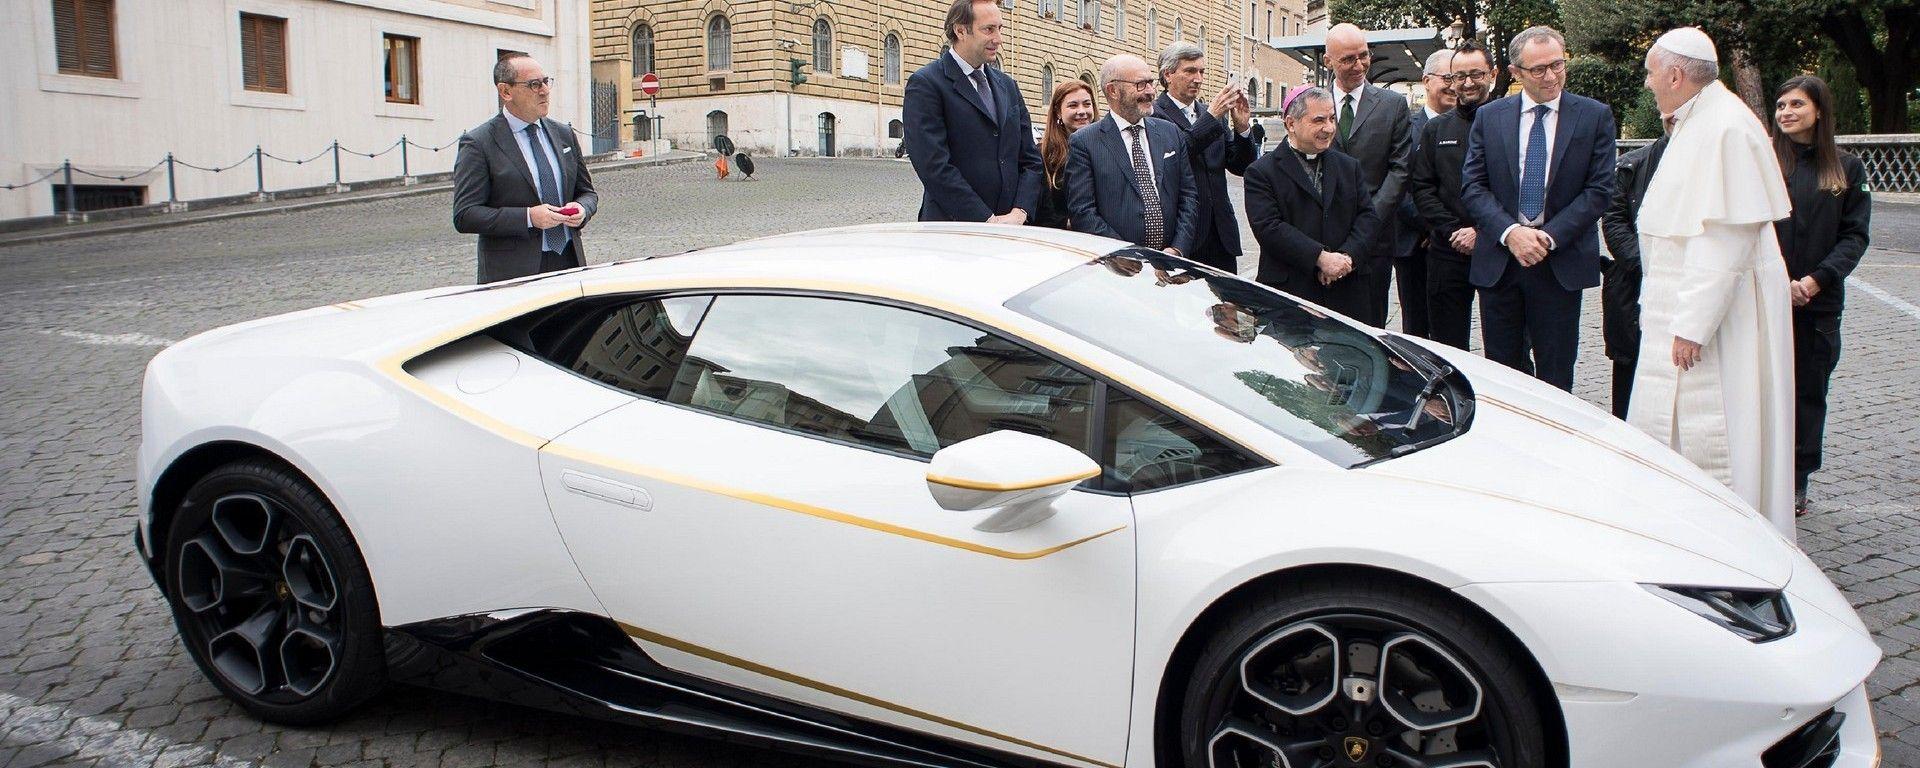 Papa Francesco vende all'asta la sua Lamborghini Huracán